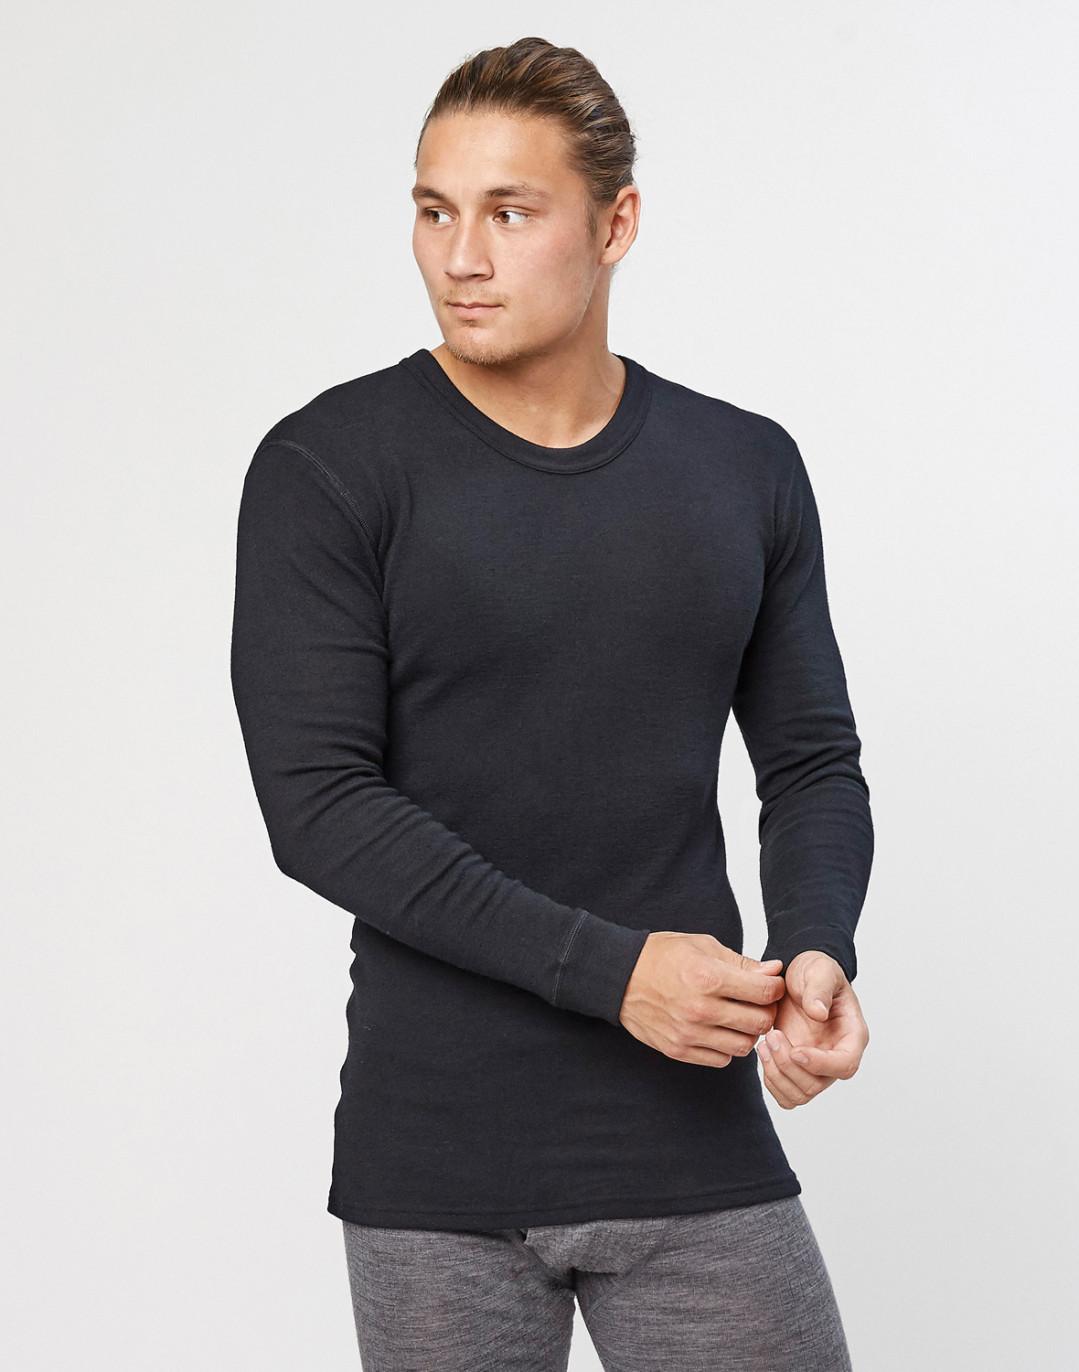 Men's long sleeve merino wool base layer- black